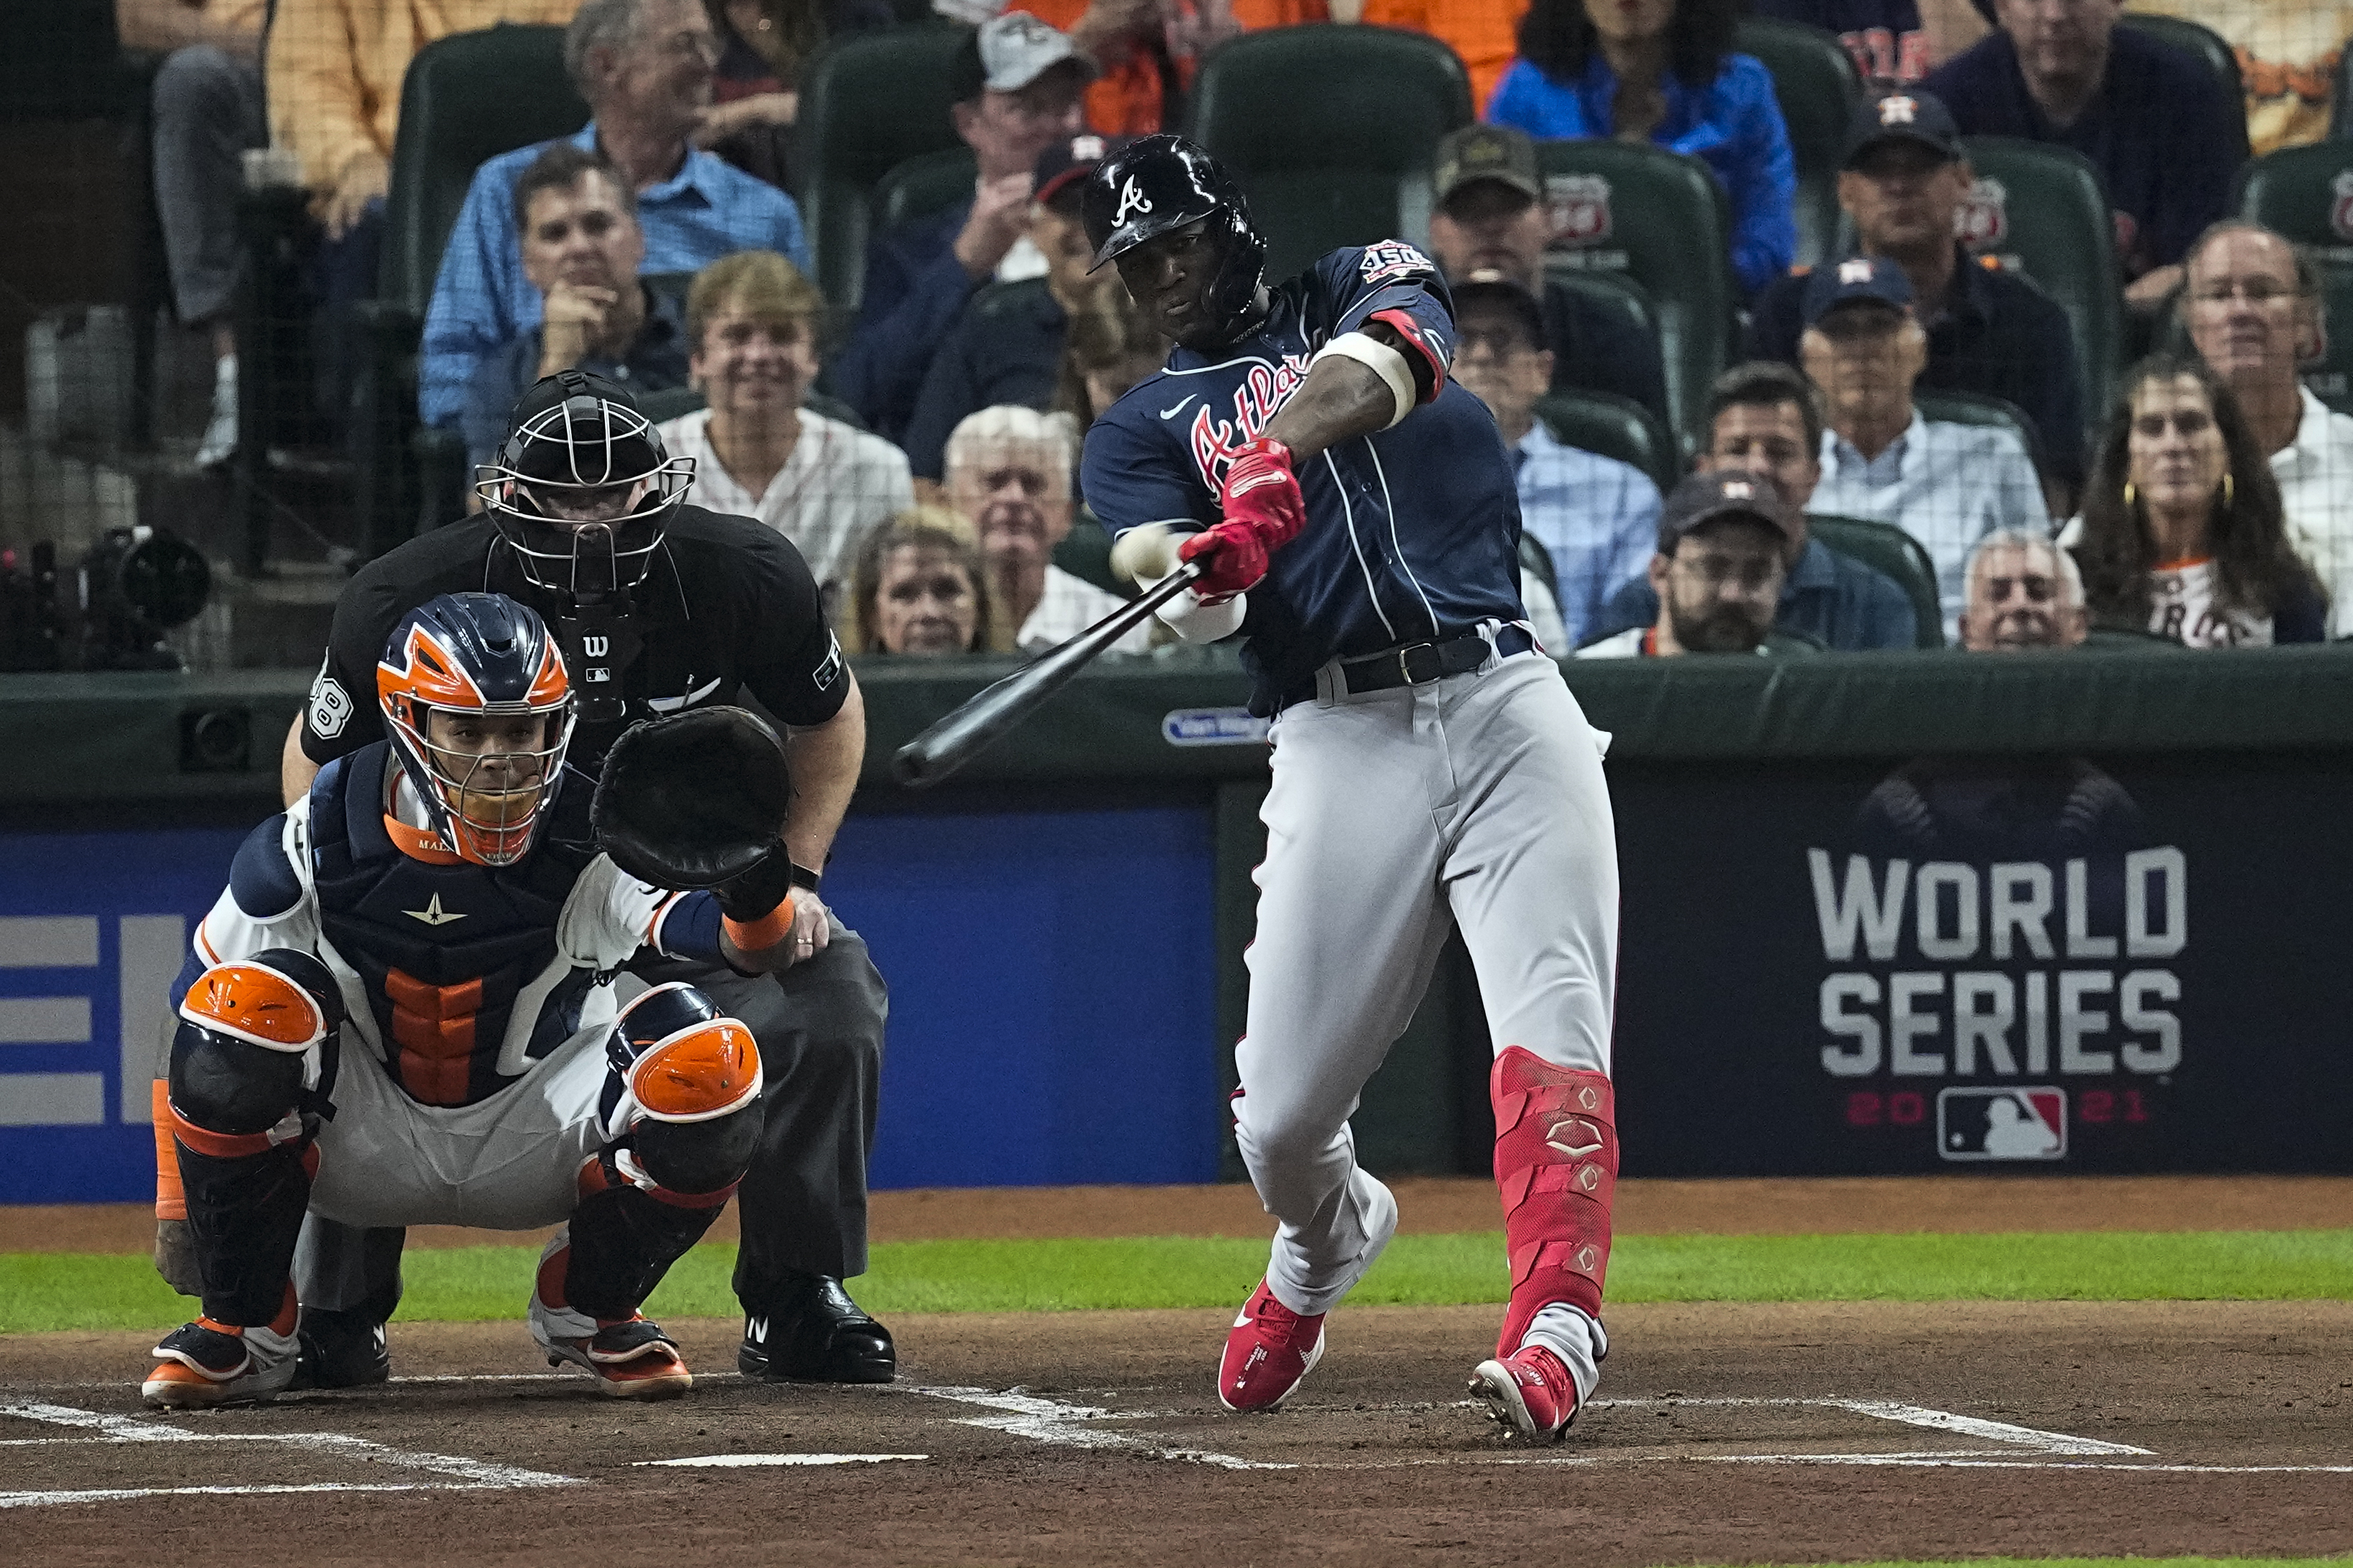 Jorge Soler, Adam Duvall Lead Braves to World Series Game 1 Win vs. Astros